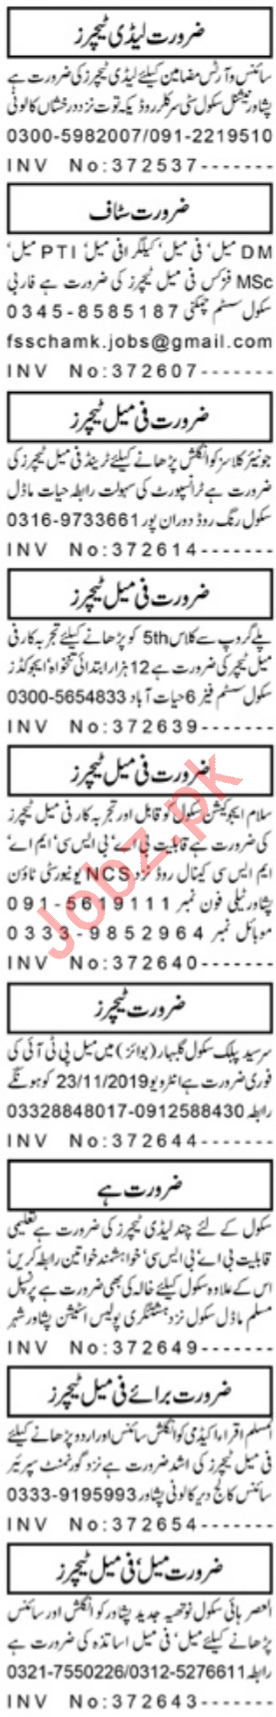 Daily Aaj Newspaper Classified Teaching Jobs 2019